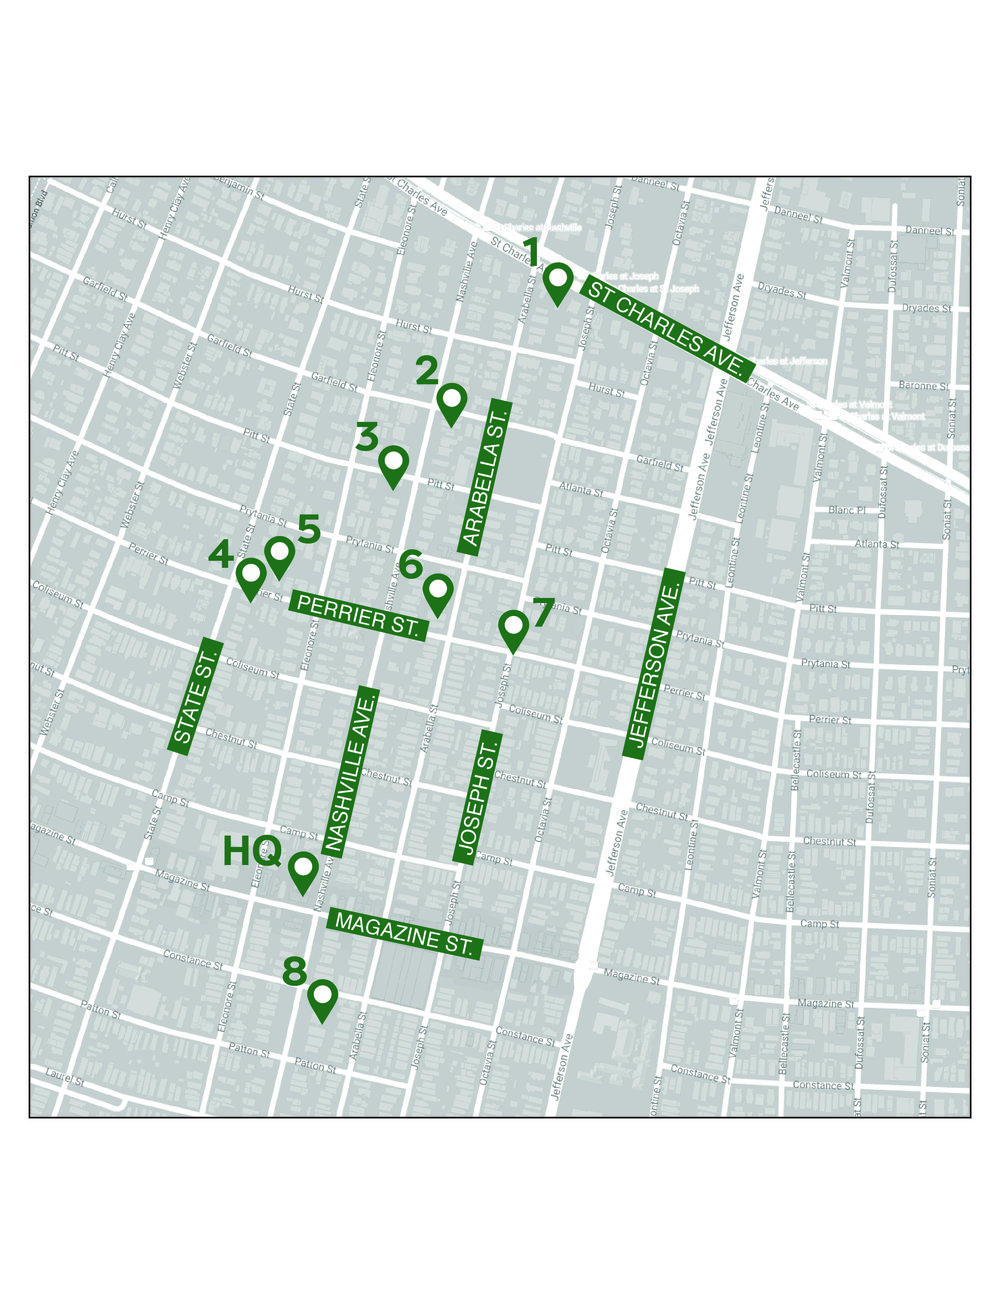 170710-Event-Map-01.jpg